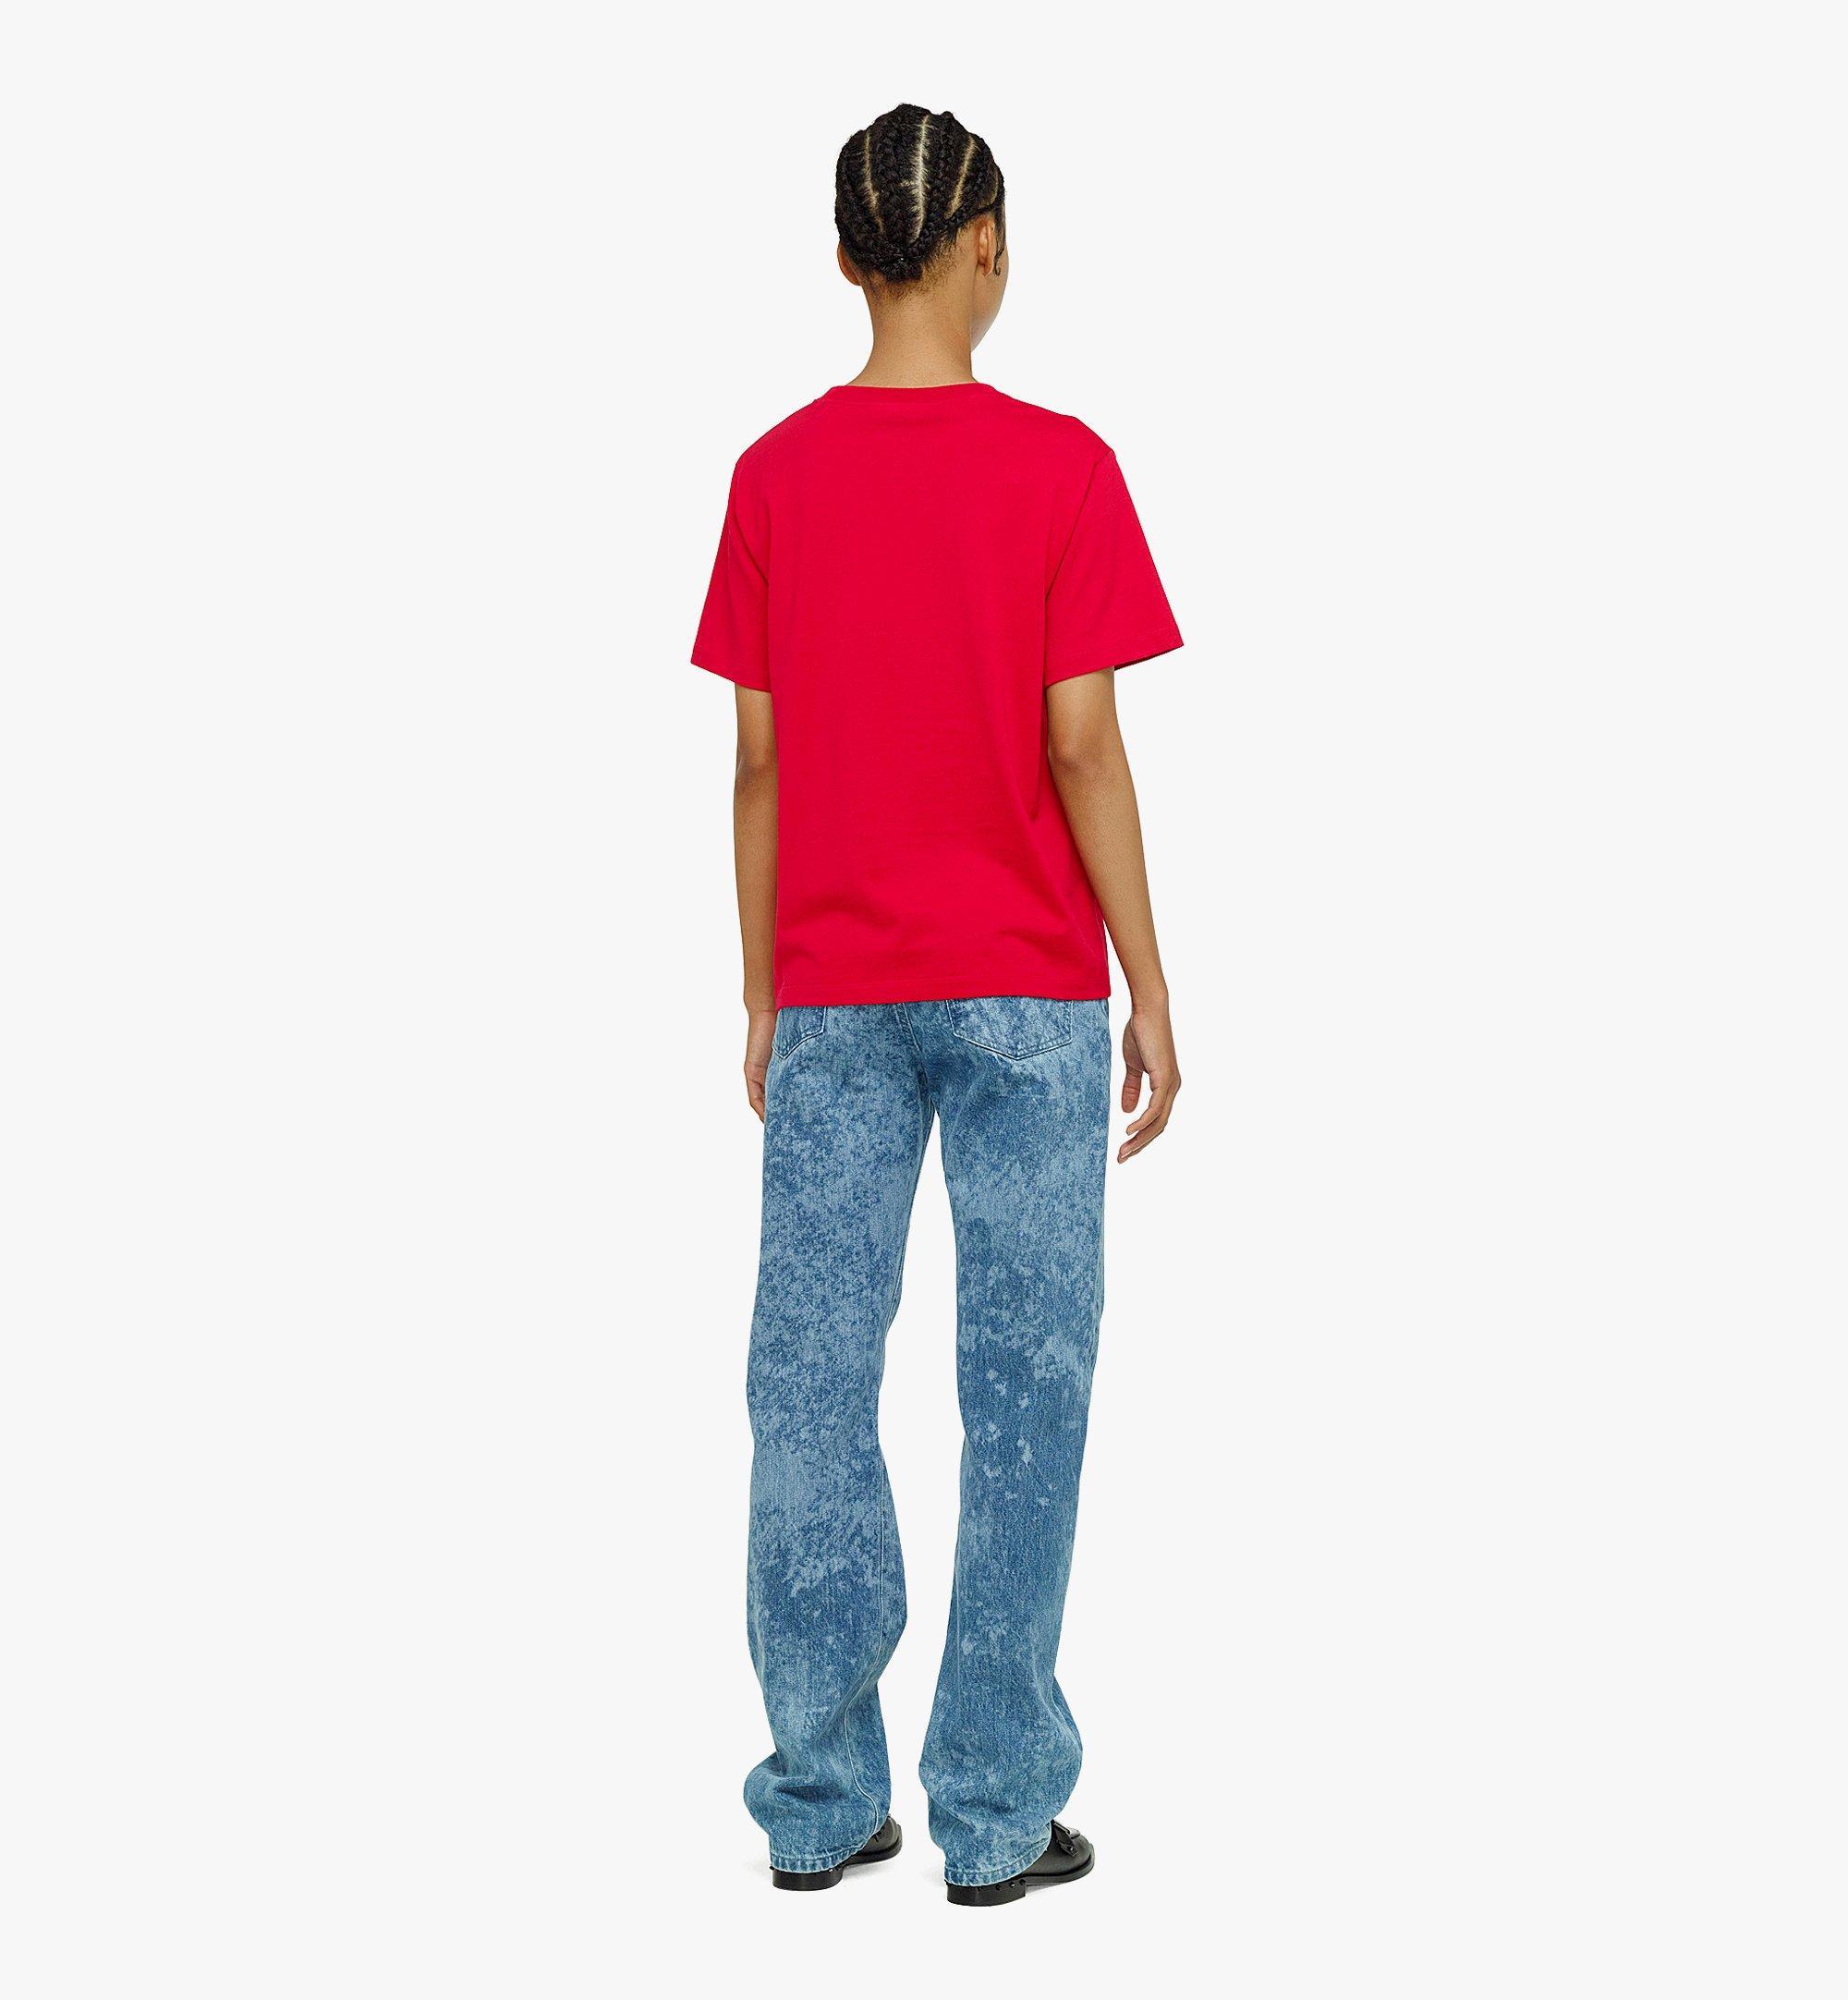 MCM Women's Organic Cotton T-Shirt with Nylon Zip Pocket Red MFTBAMM02R00XS Alternate View 2